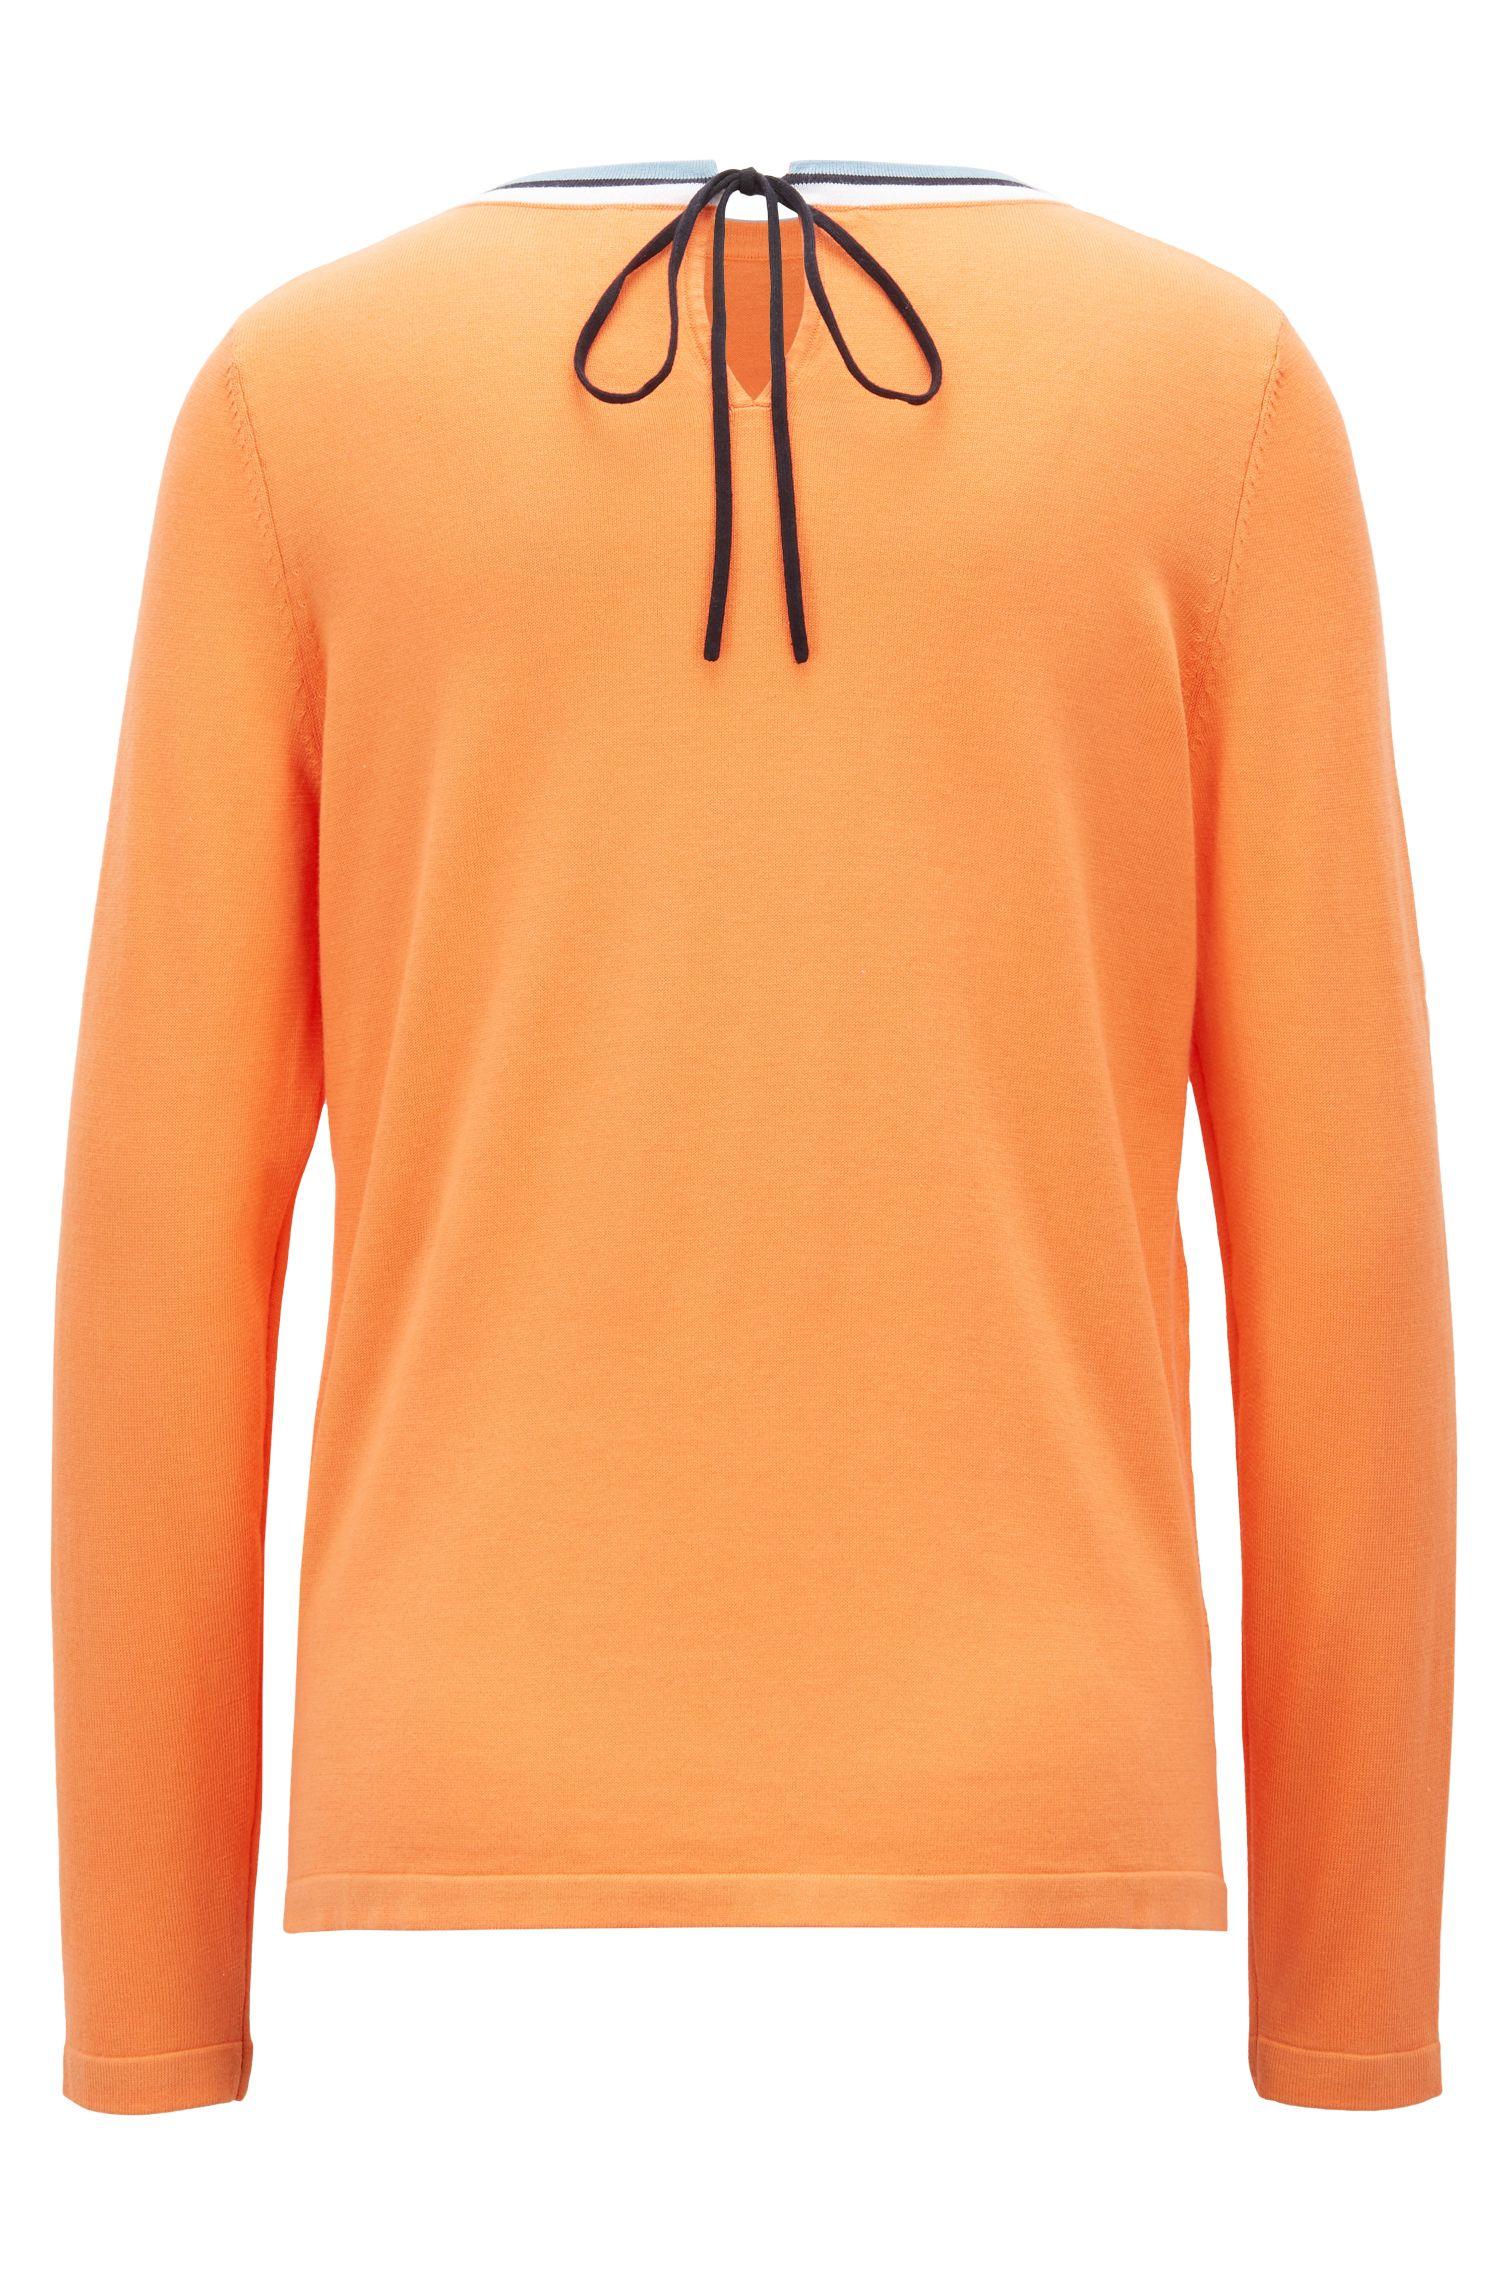 Cotton-blend sweater with striped crew neck, Orange